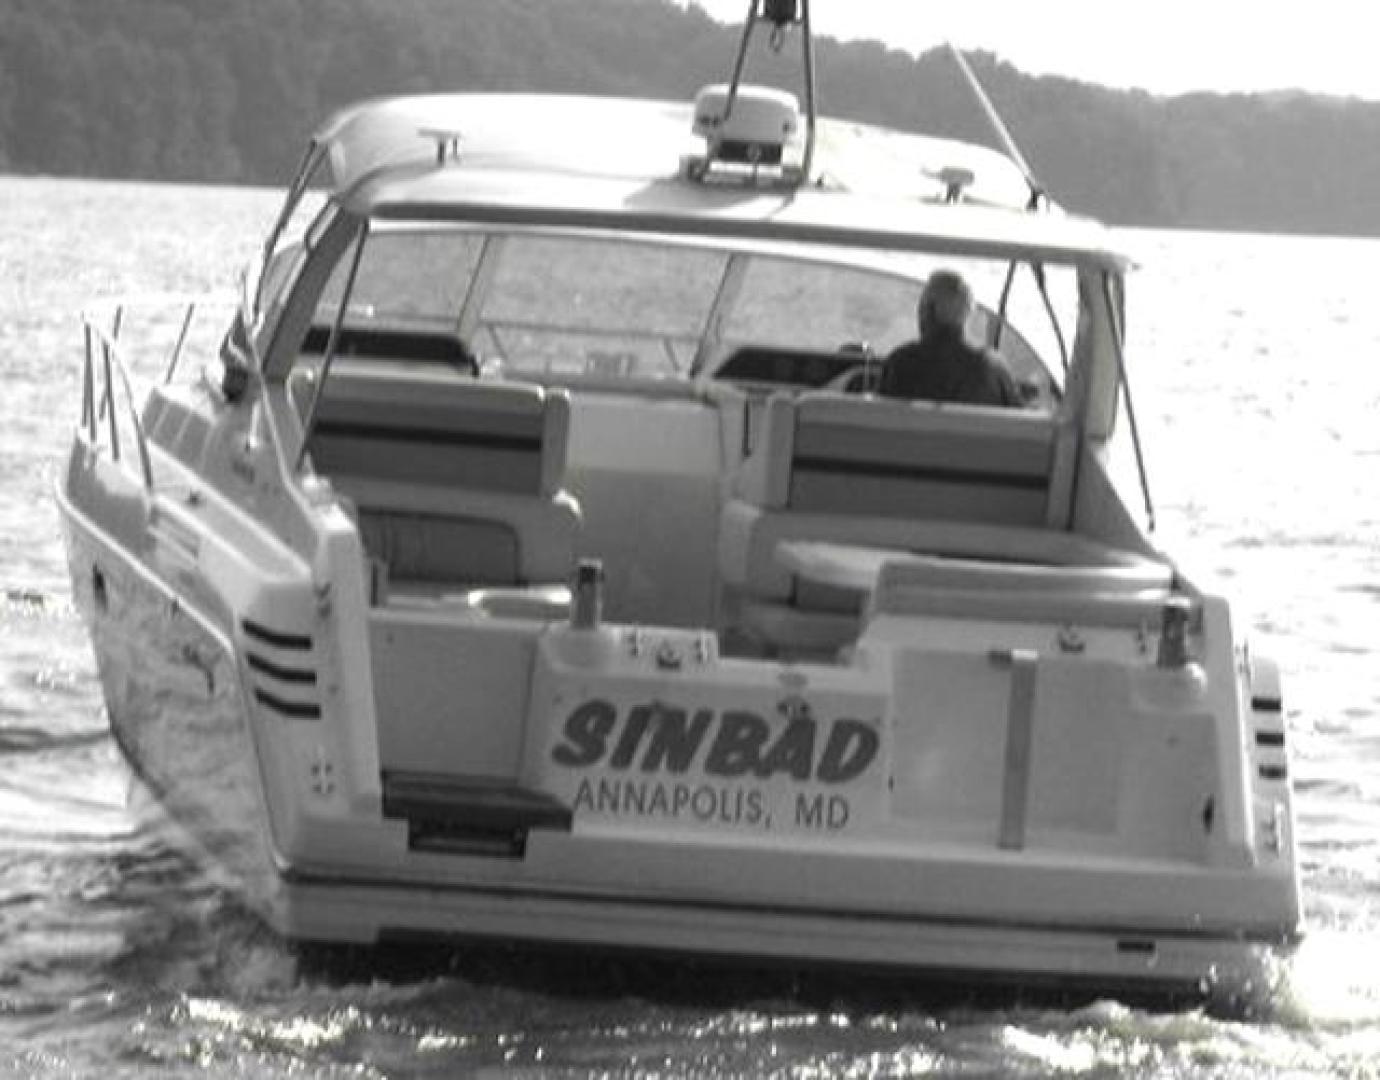 Cranchi-Mediterranée 40 1997-Sinbad Annapolis-Maryland-United States-Stern-923088 | Thumbnail